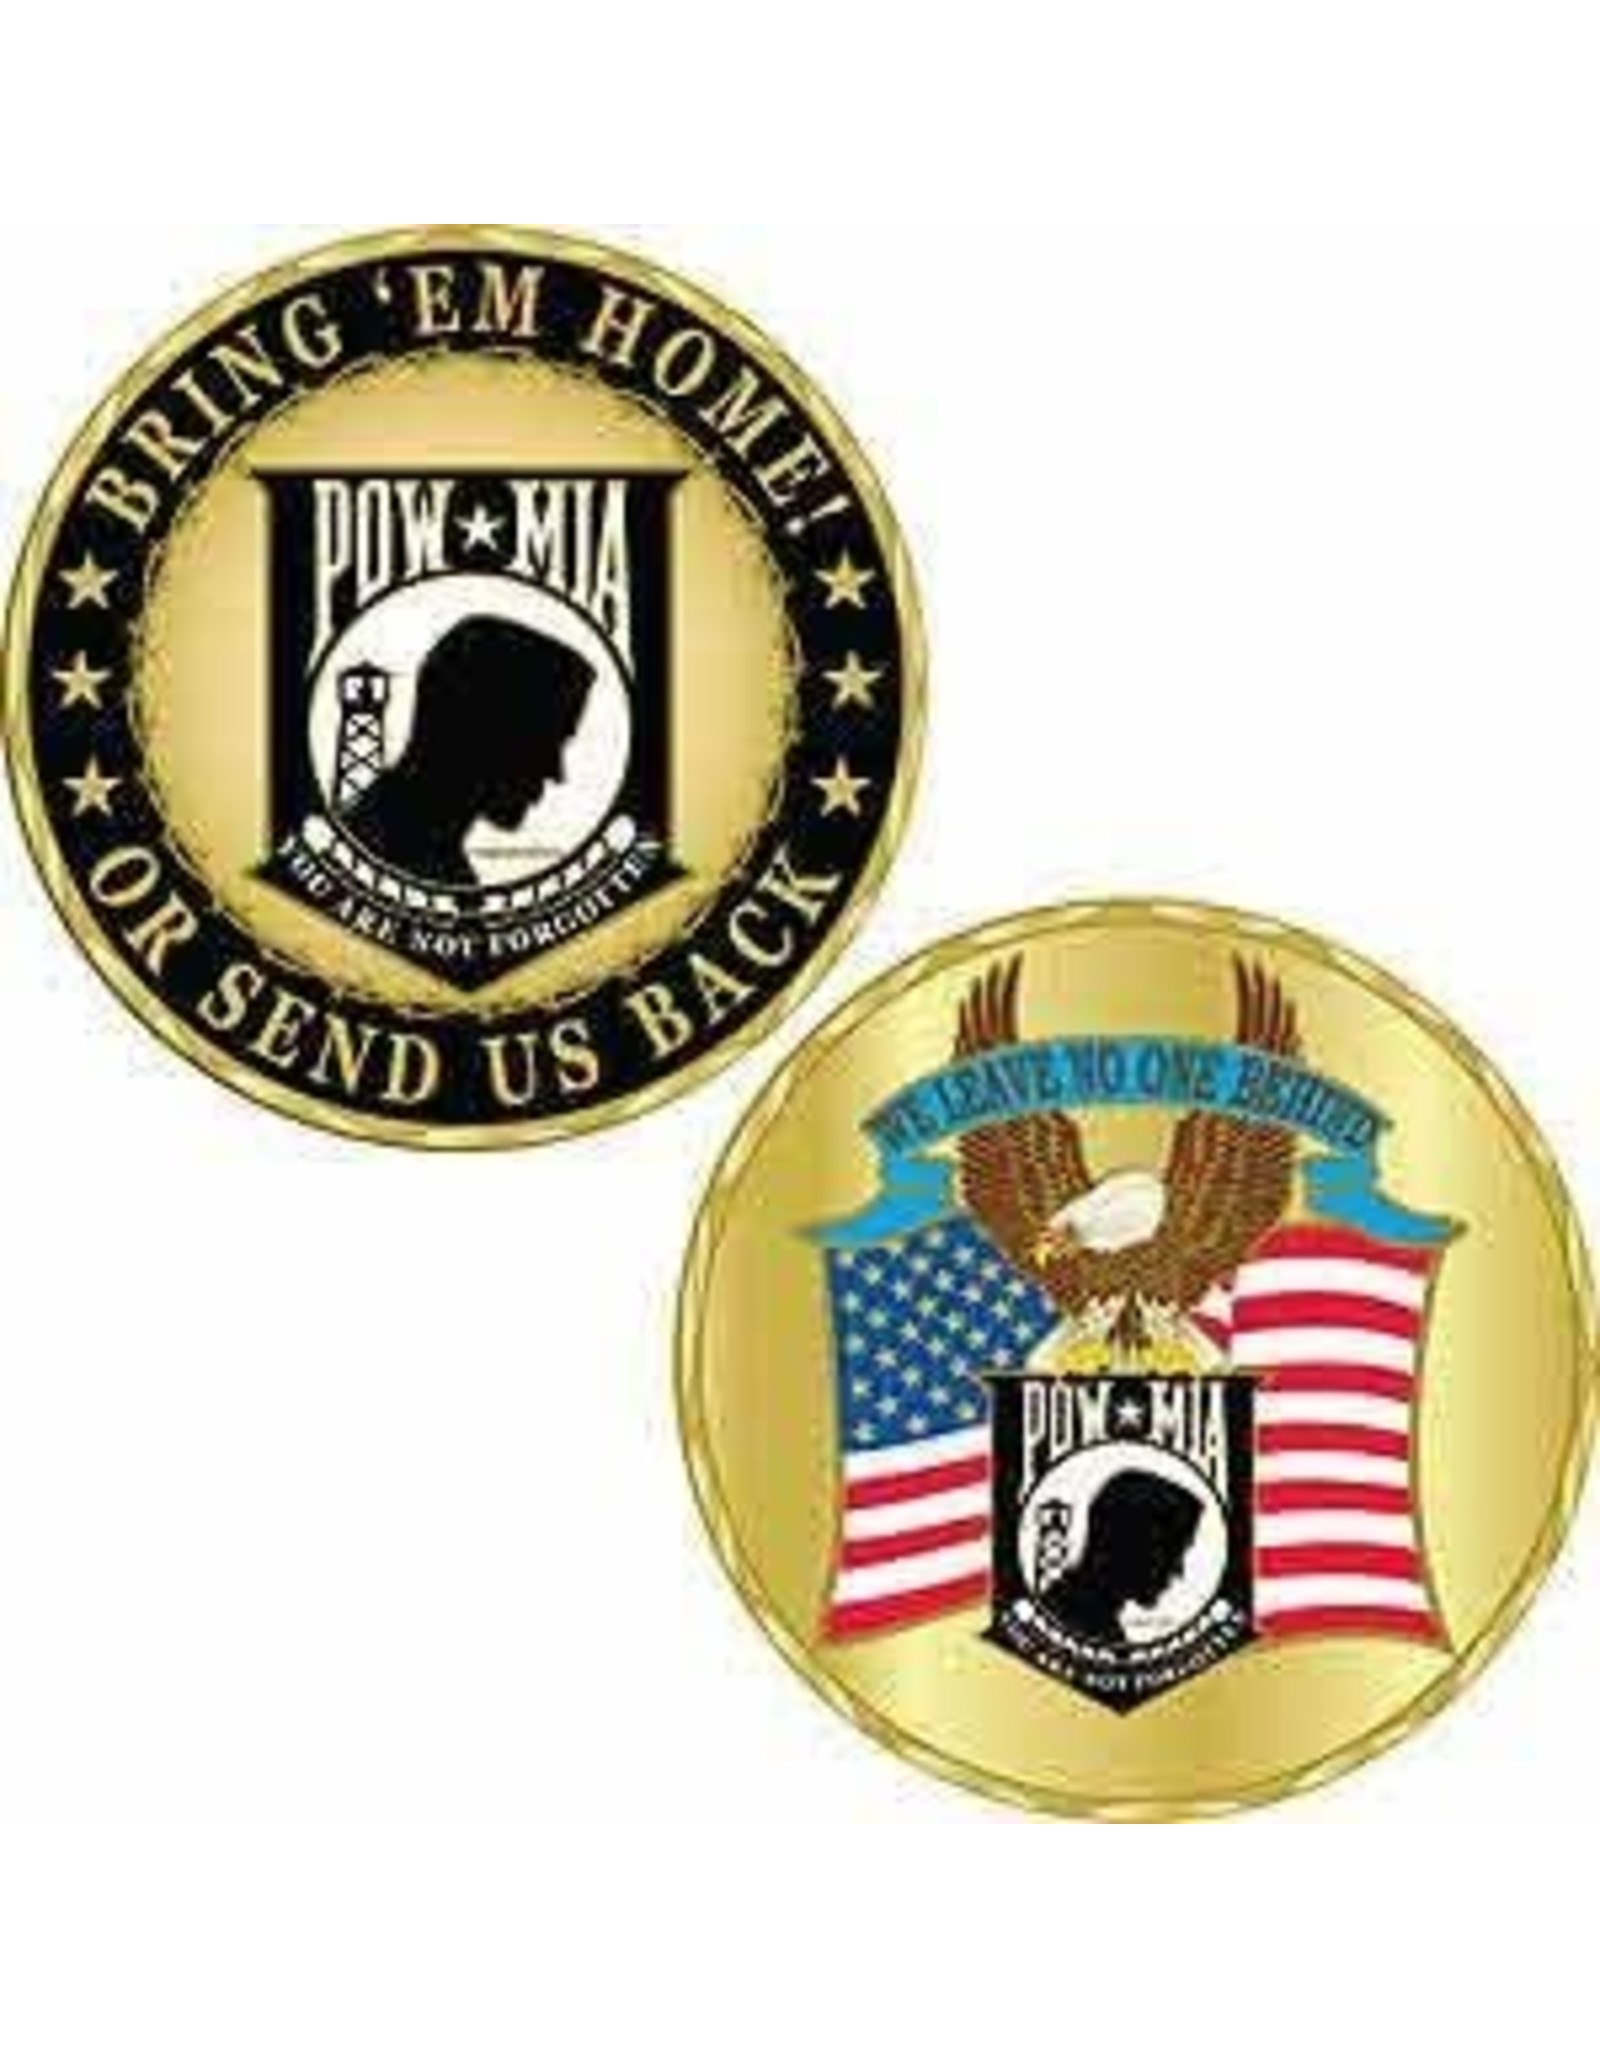 Challenge Coin - POWMIA S